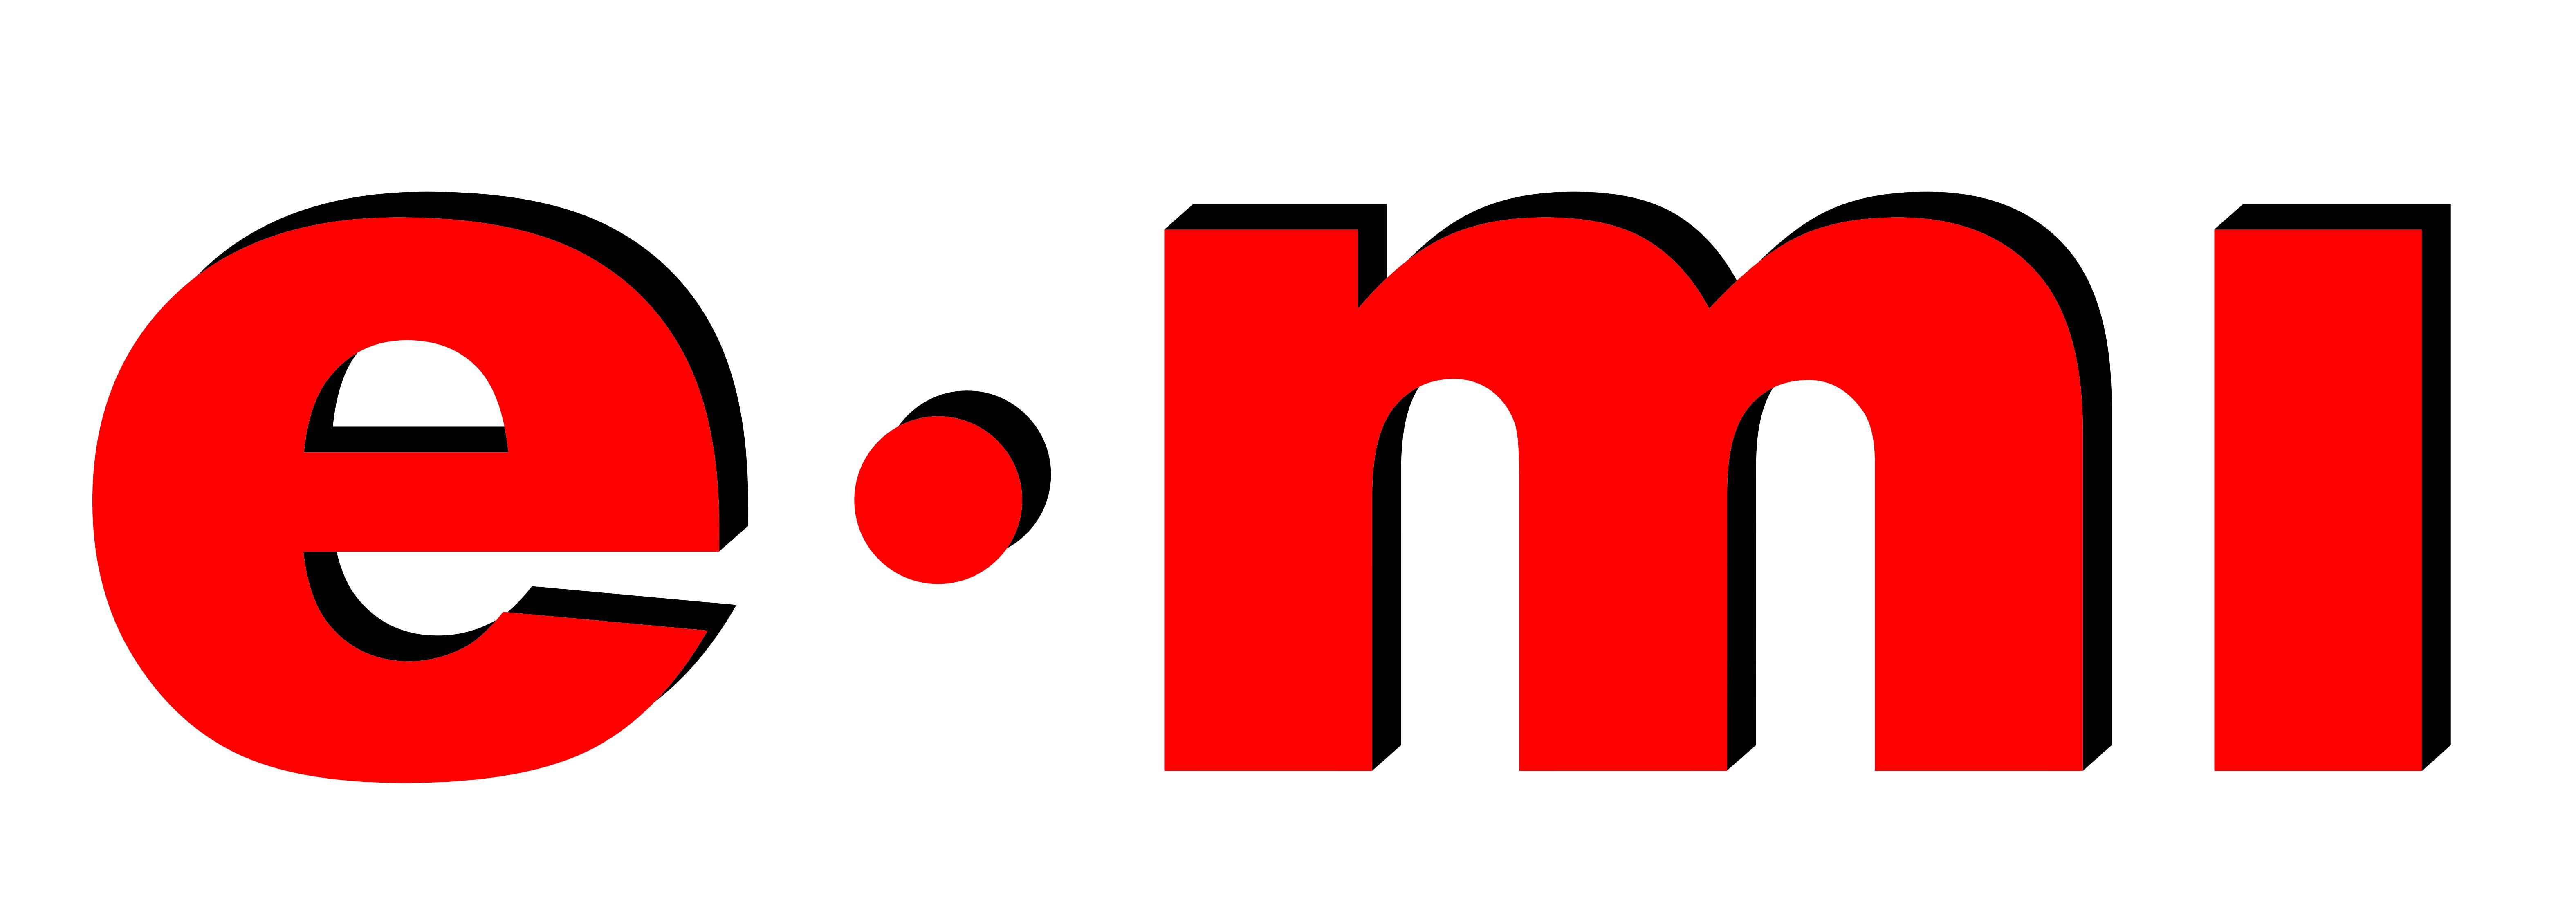 Emi corporation